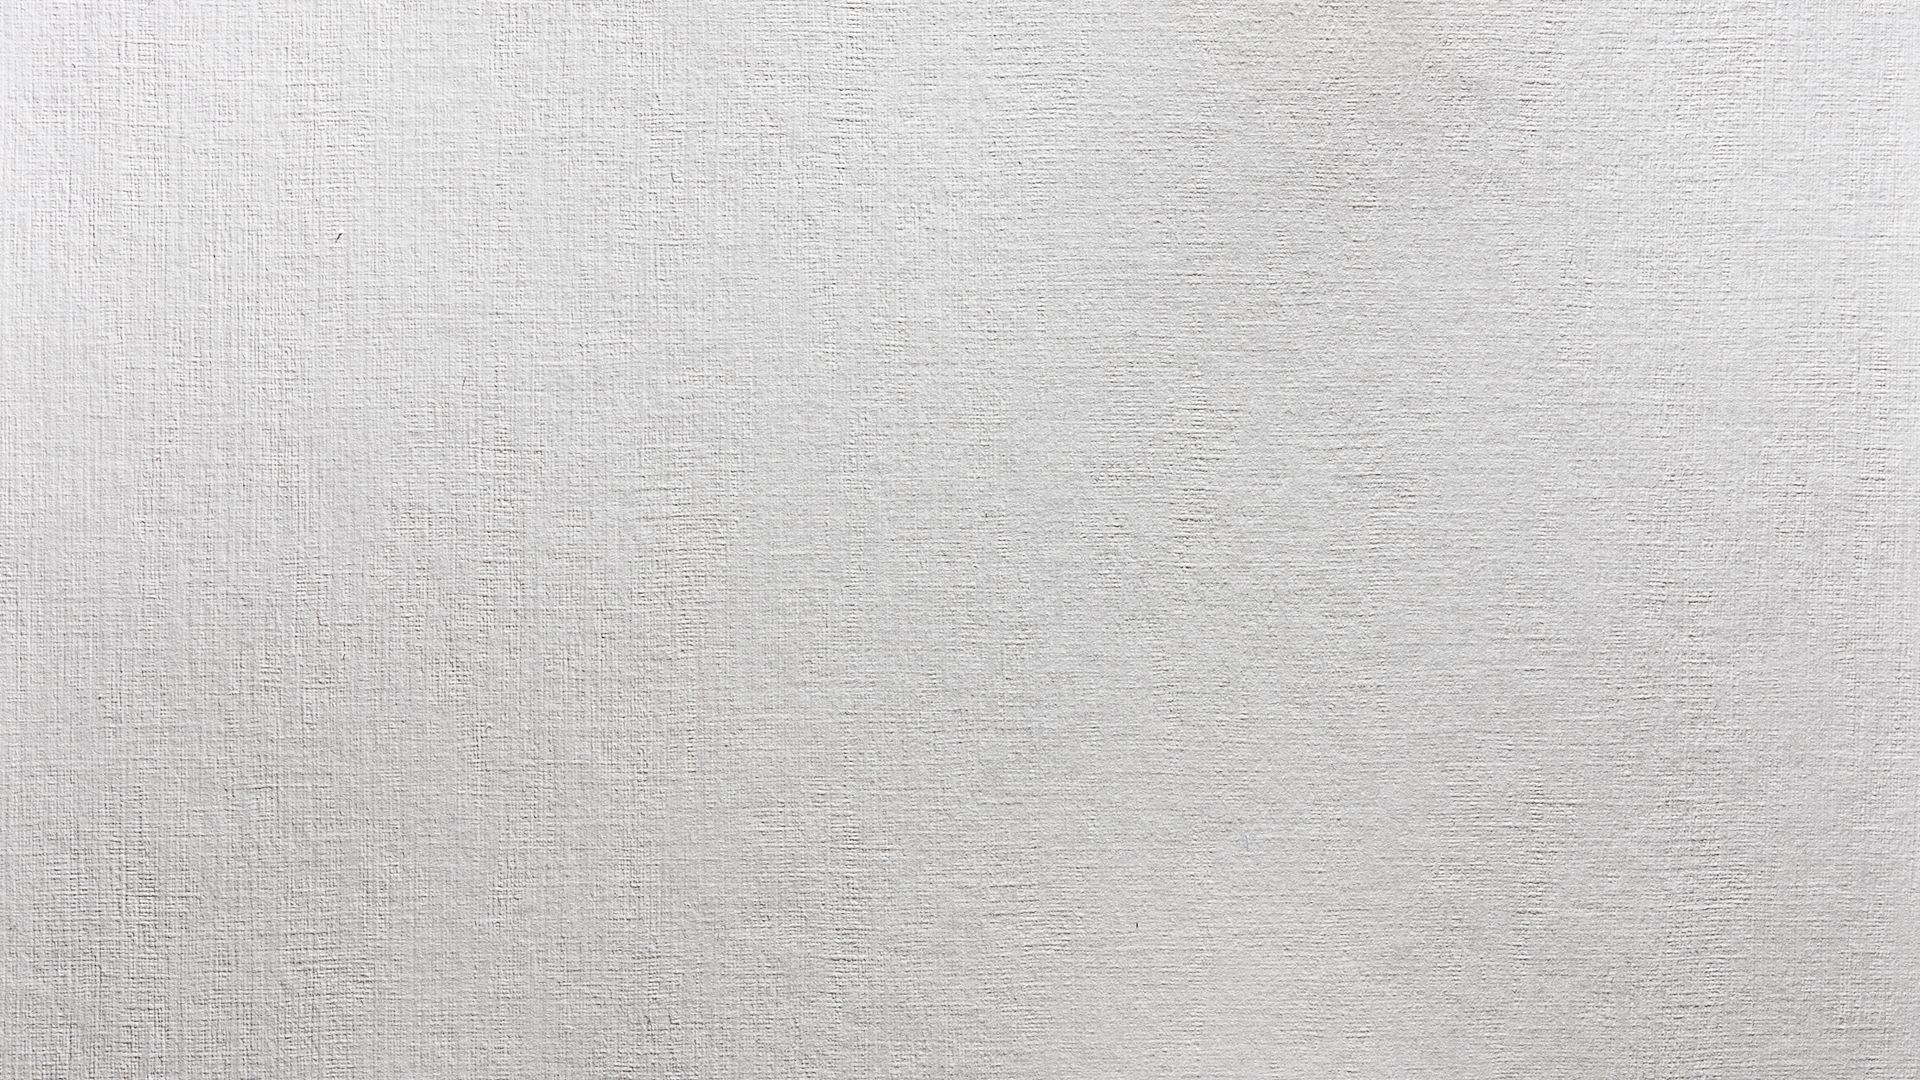 17 Best images about Textures on Pinterest | Color black, 50 ...